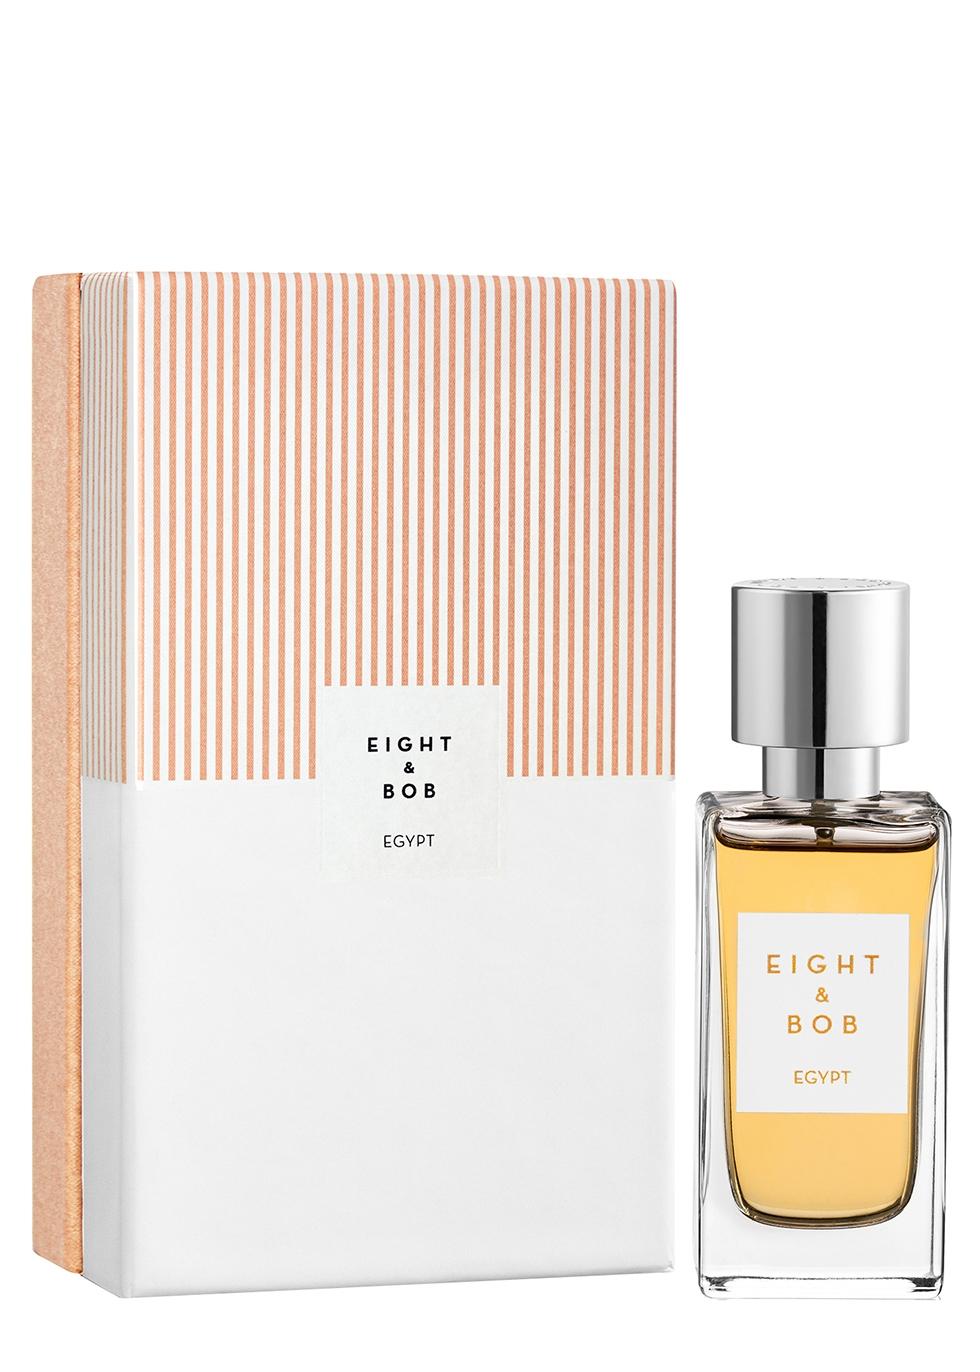 Eight & Bob | Egypt Eau de Parfum | The